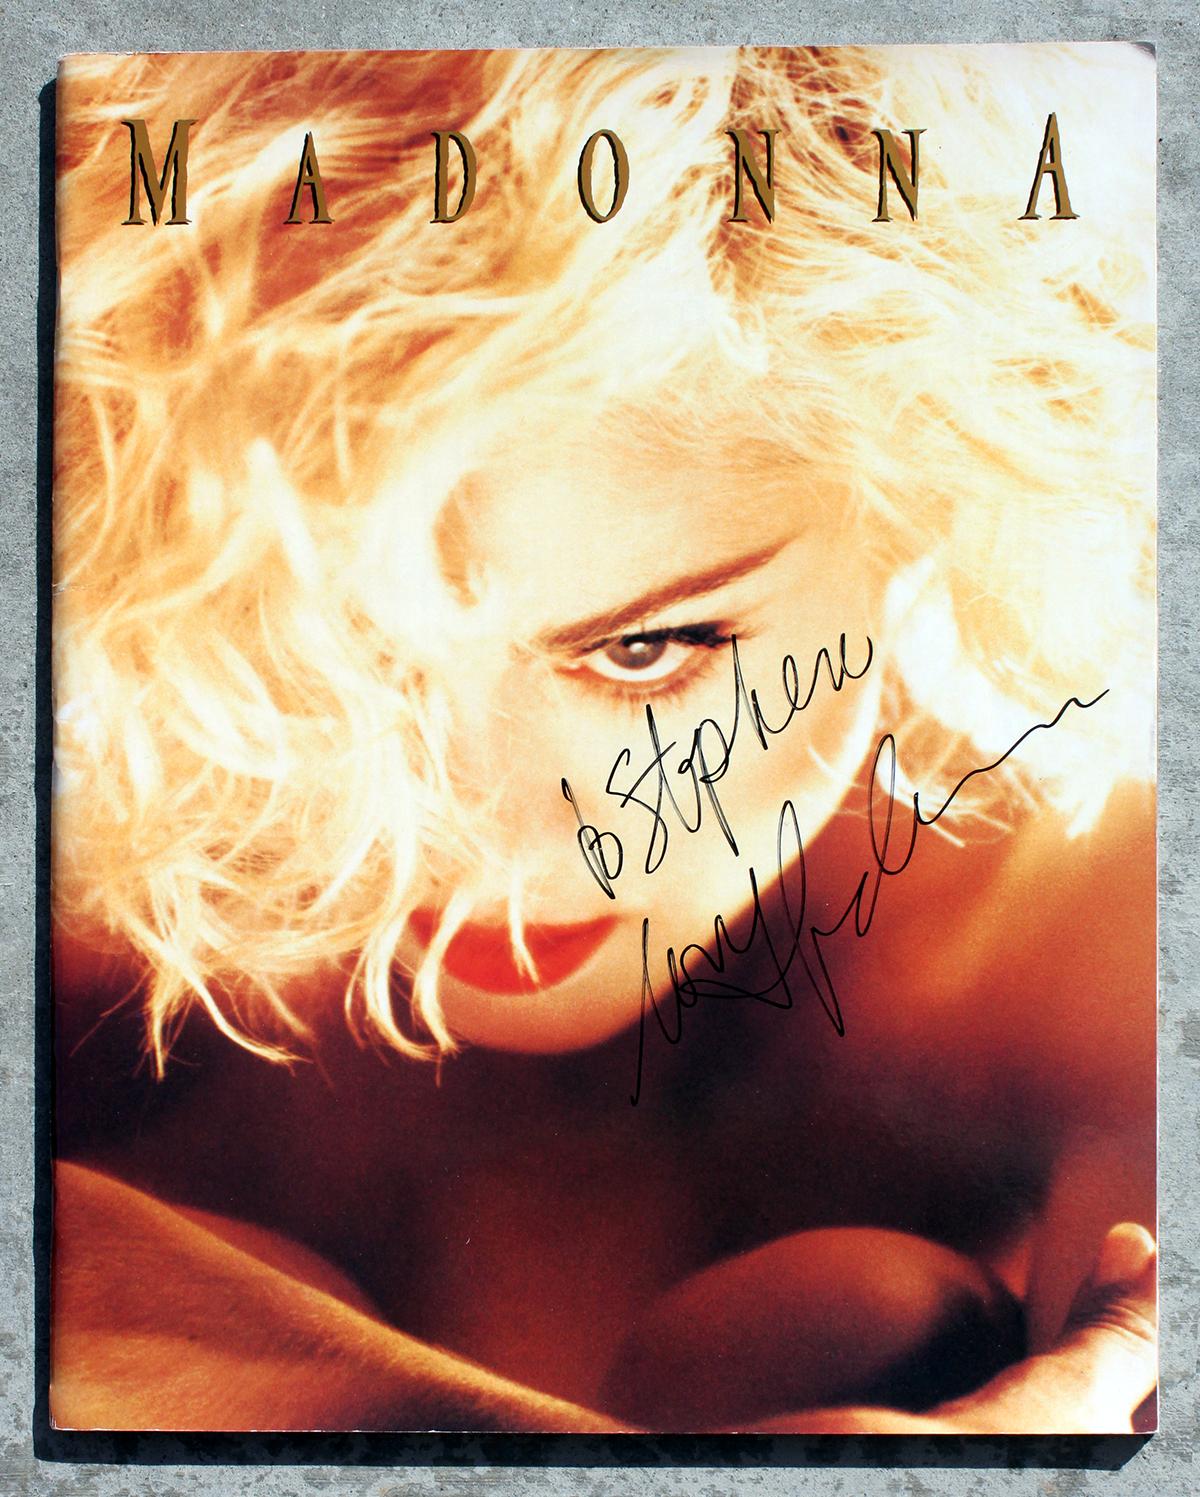 Tourbook - Madonna #2